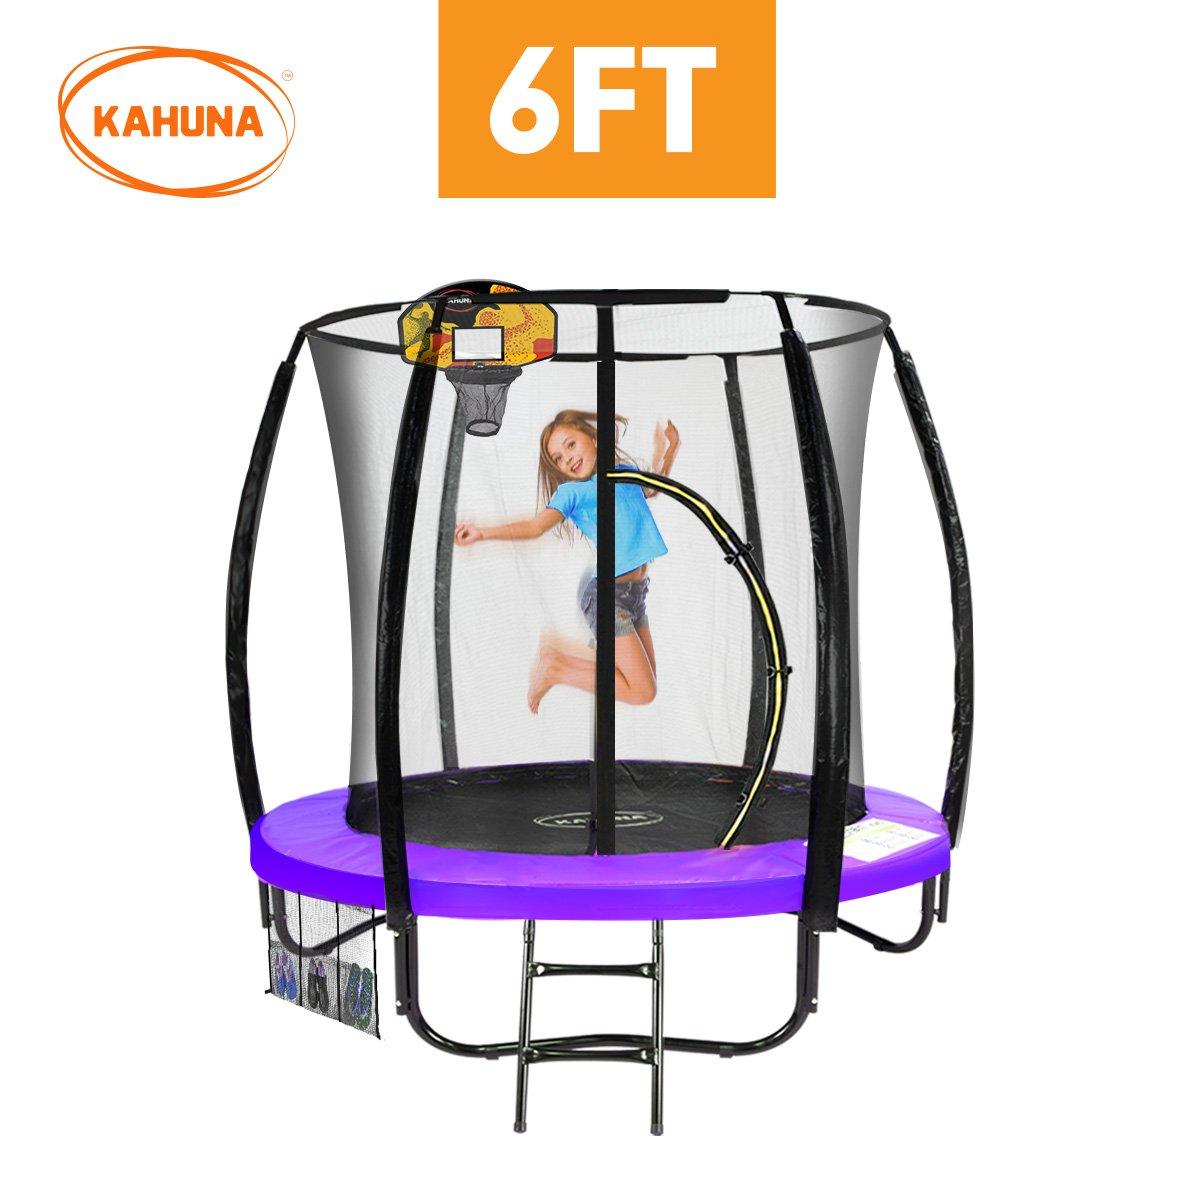 Kahuna Classic 6ft Trampoline - Purple